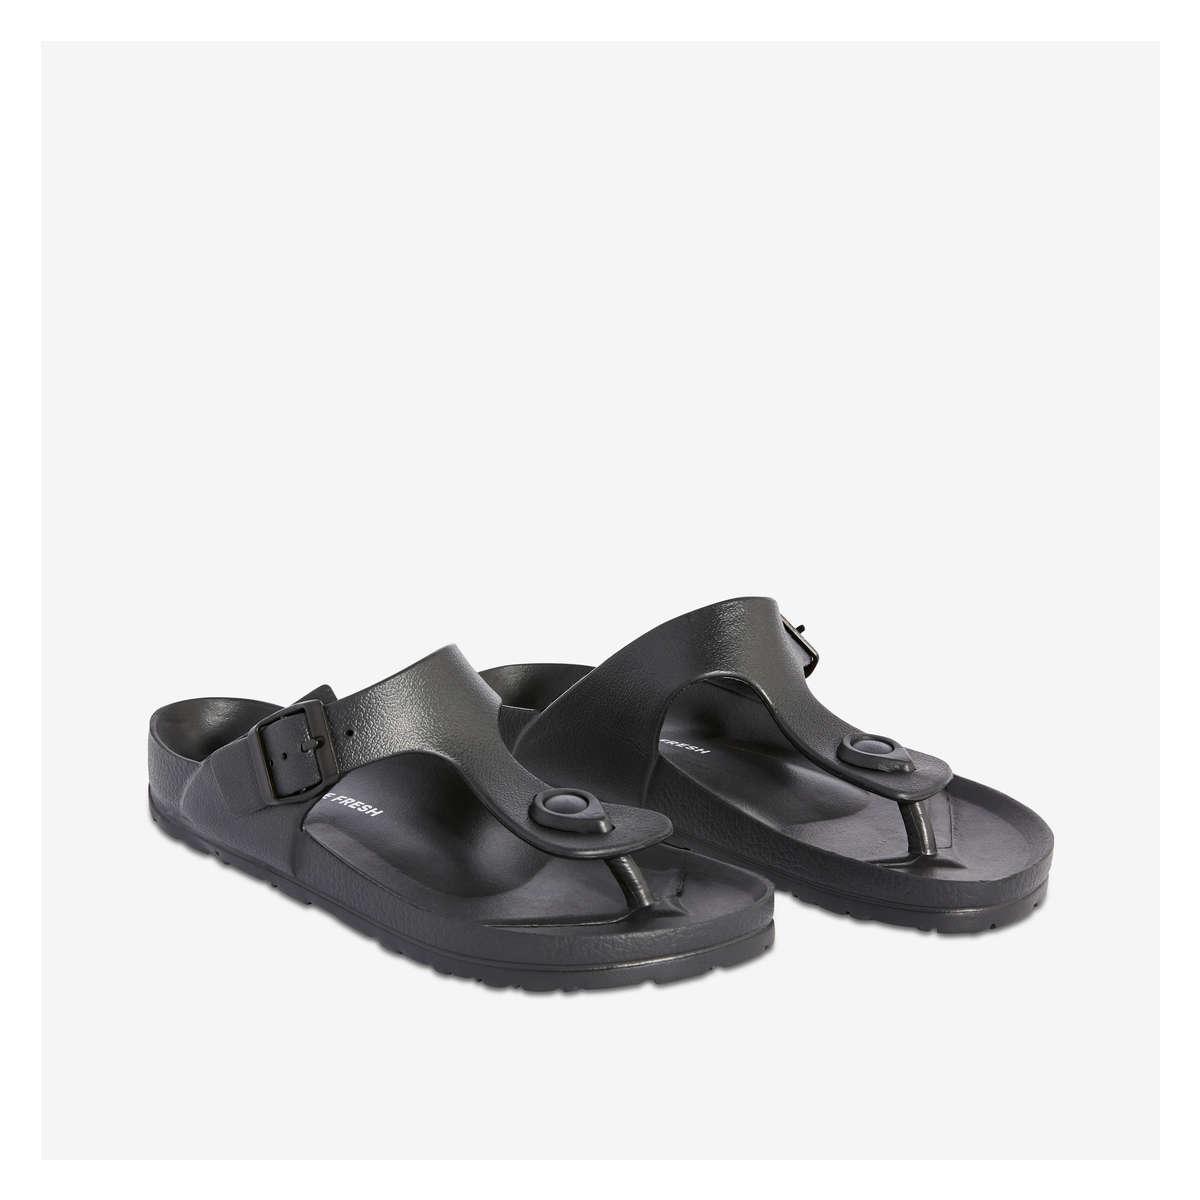 93228d03c68 Footbed Thong Sandal in Black from Joe Fresh